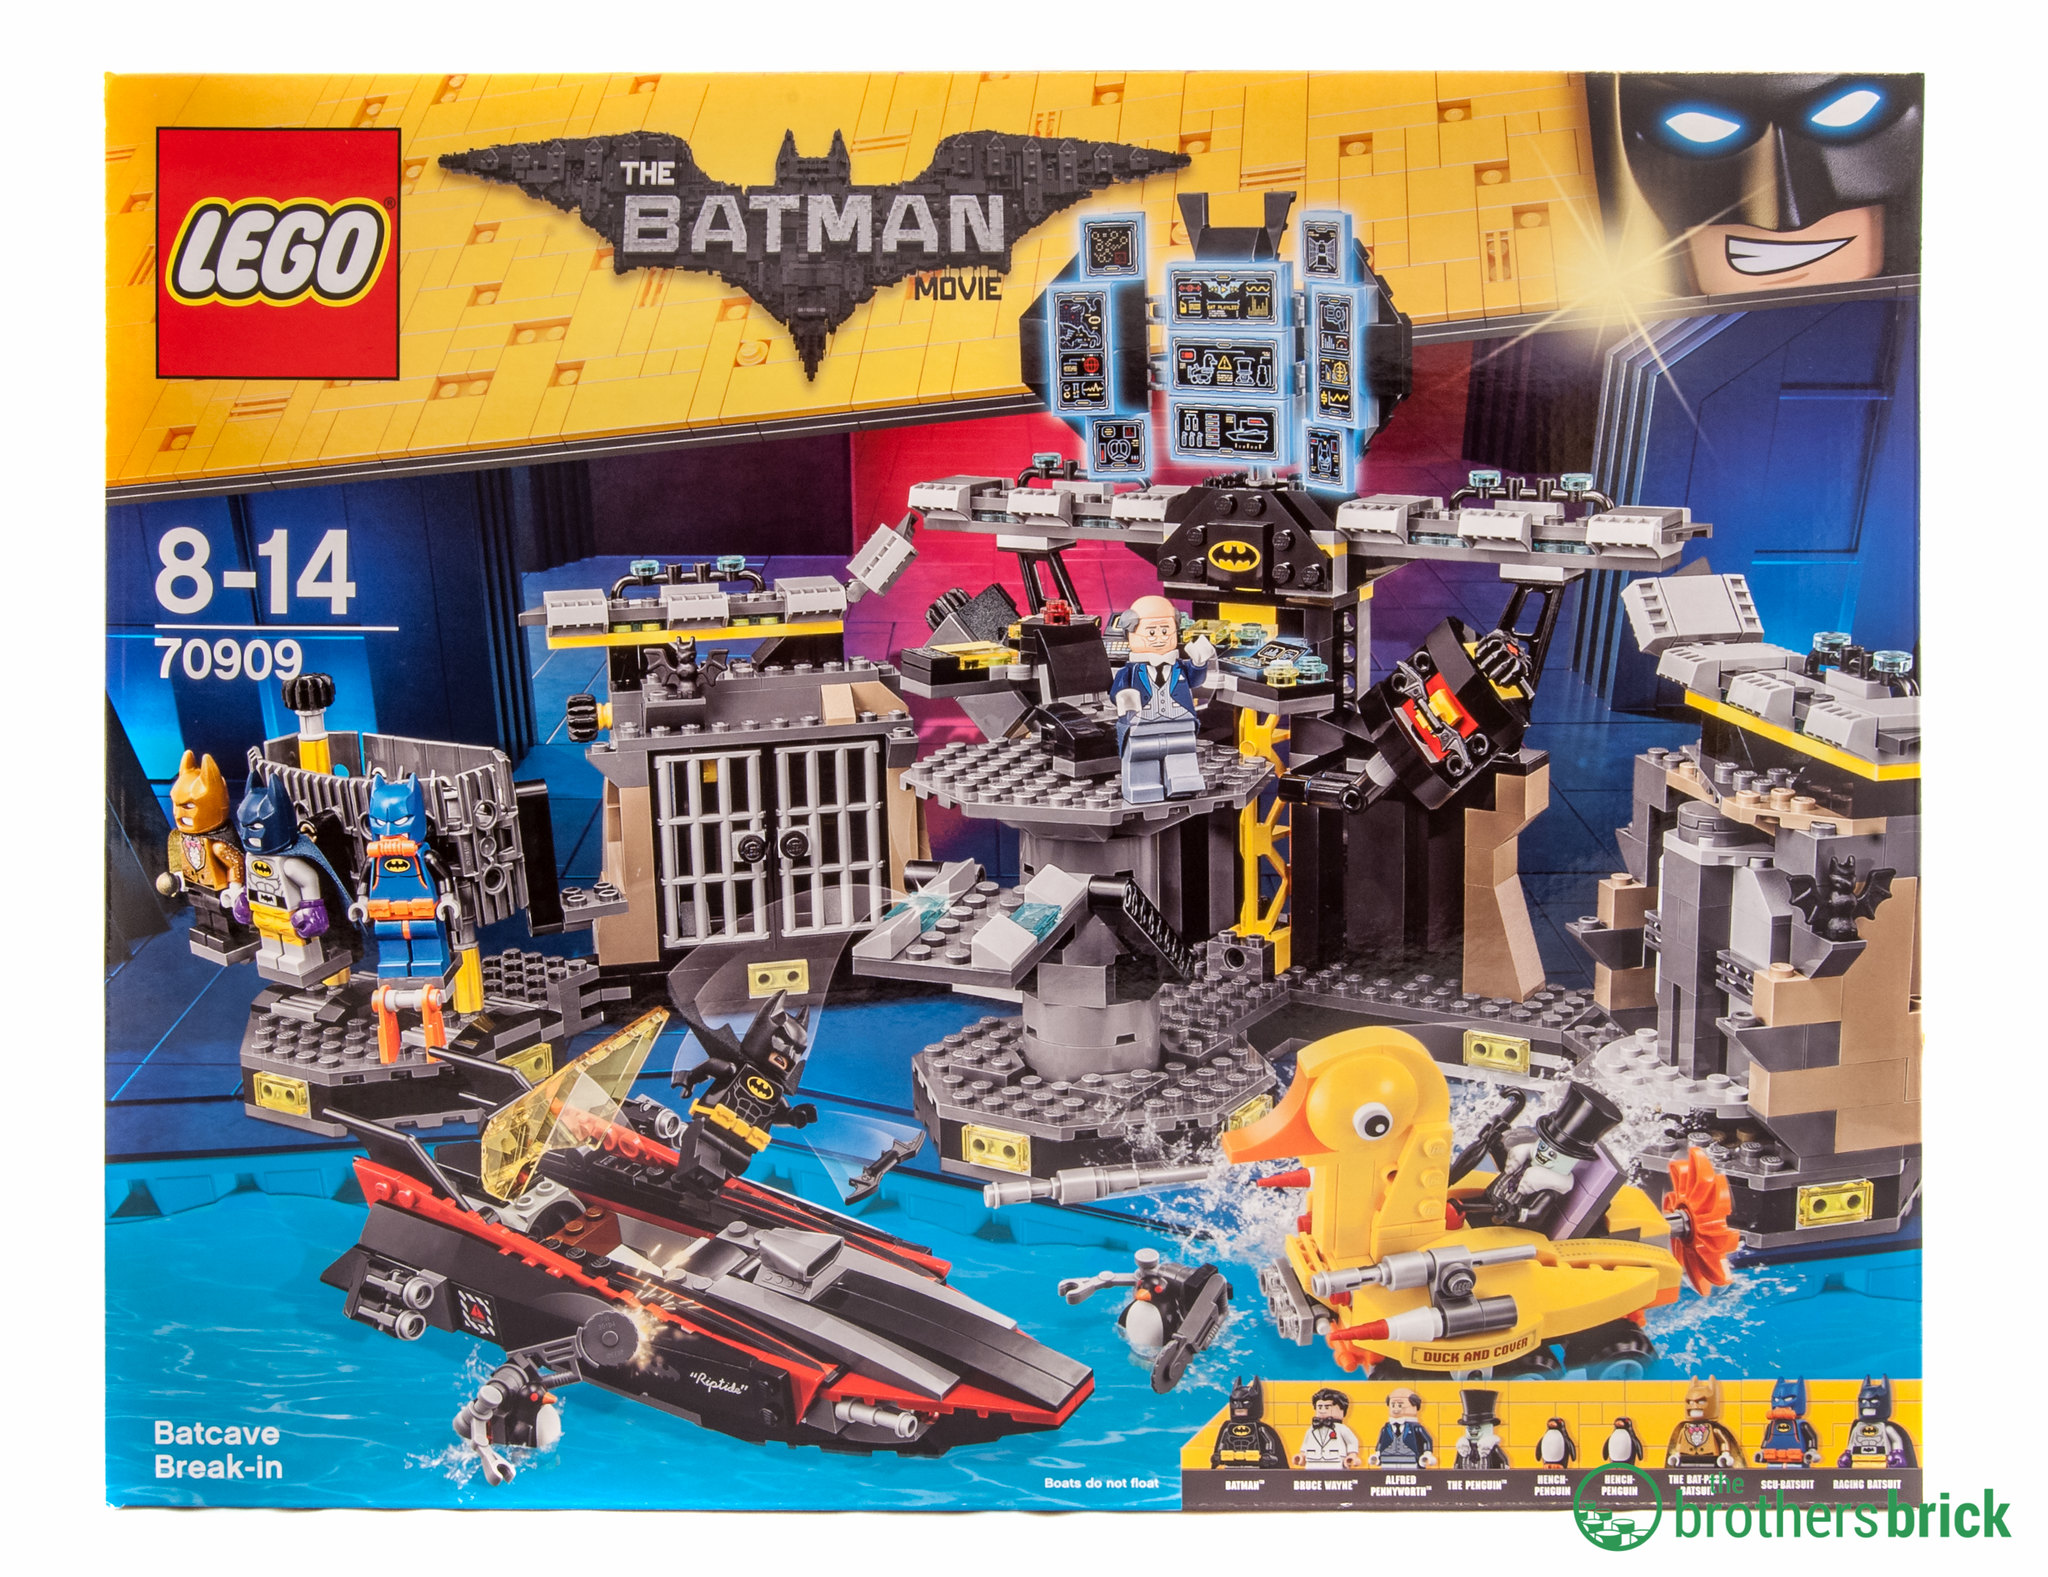 LEGO Batman Movie 70909 Batcave Break-in Review | The ...